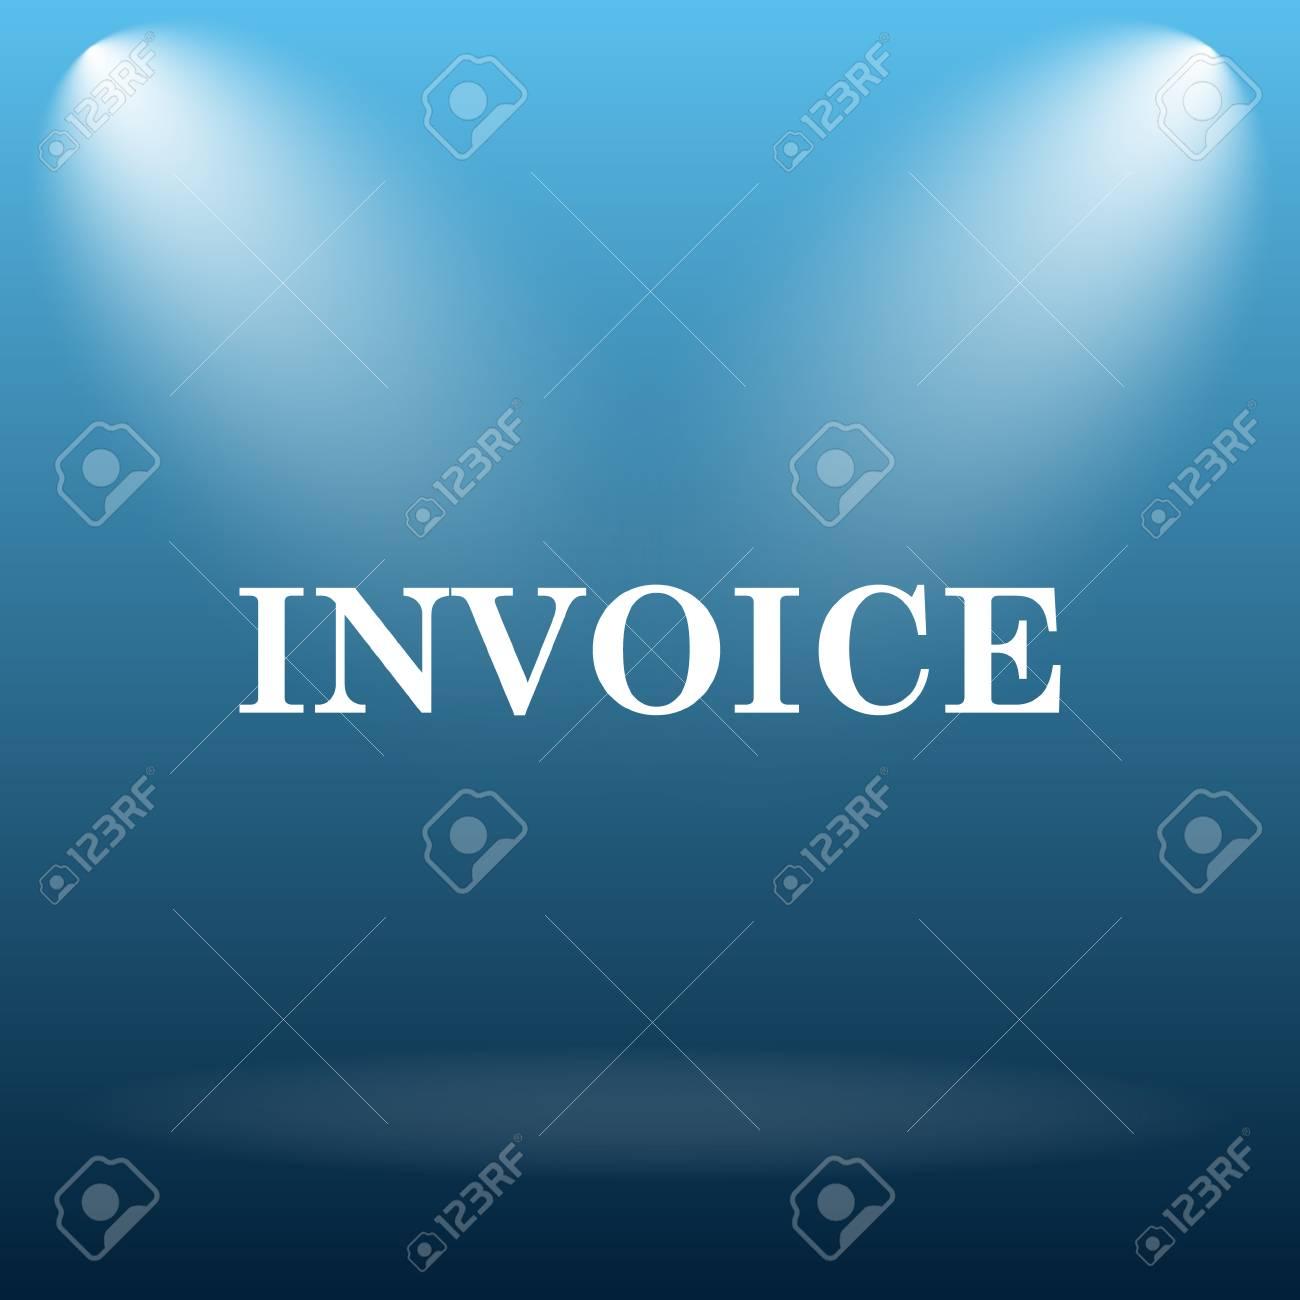 invoice icon internet button on blue background stock photo 53243861